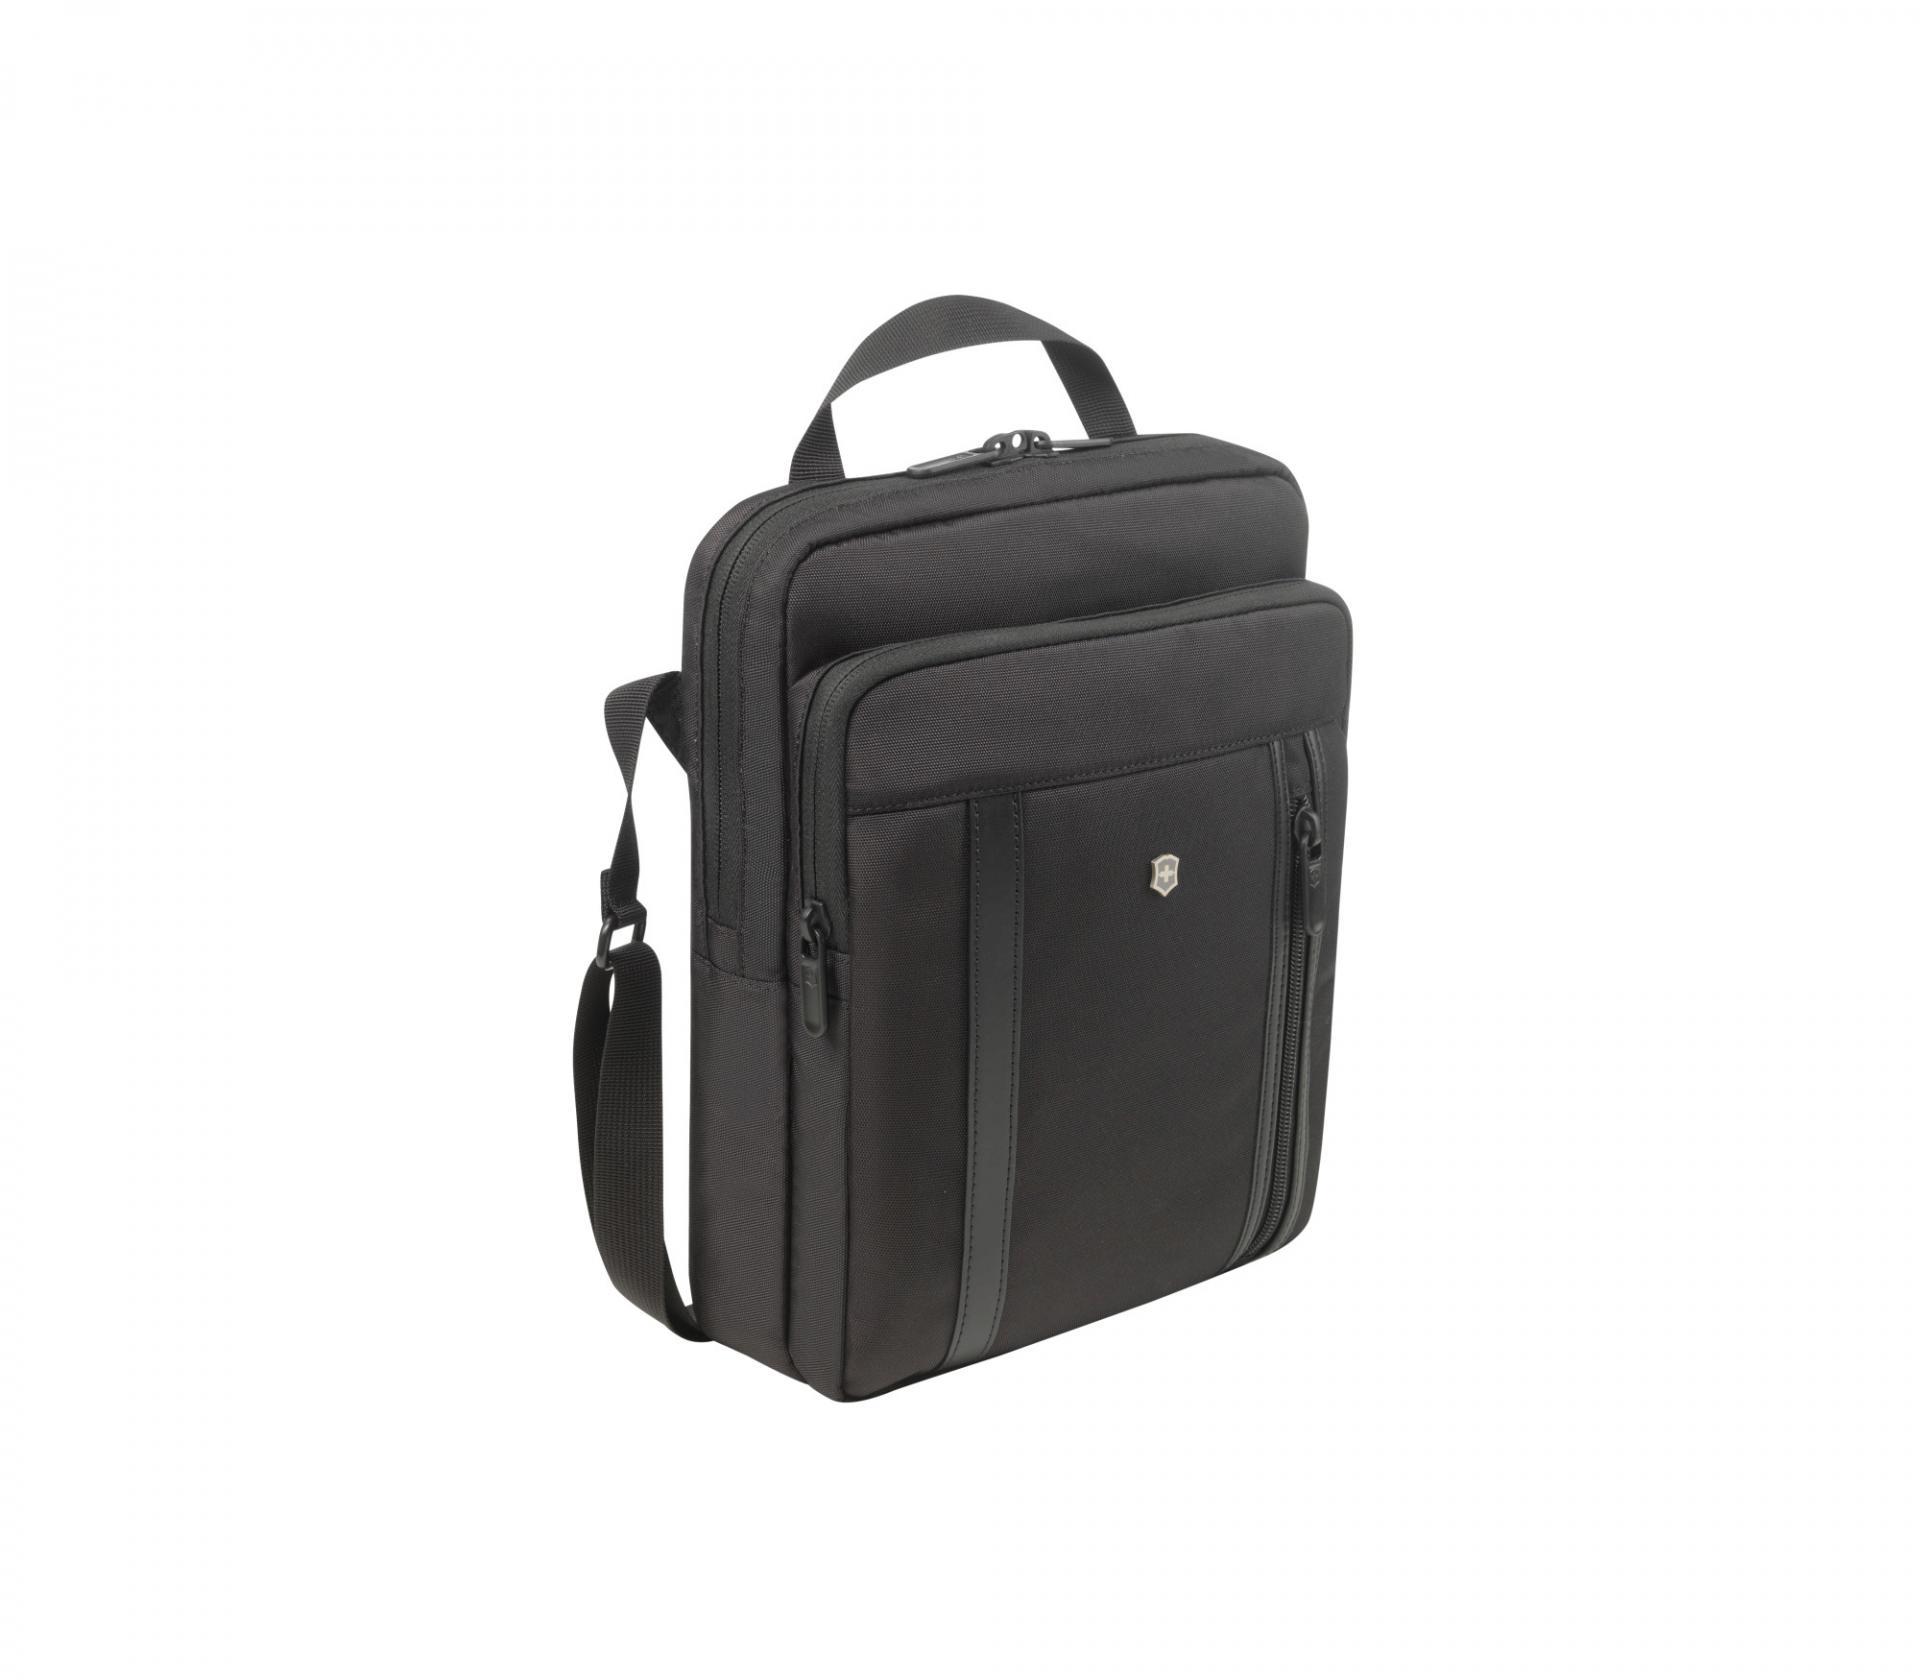 Bolso Victorinox Werks Professional 2.0, Crossbody Laptop Bag, Black 604991 *